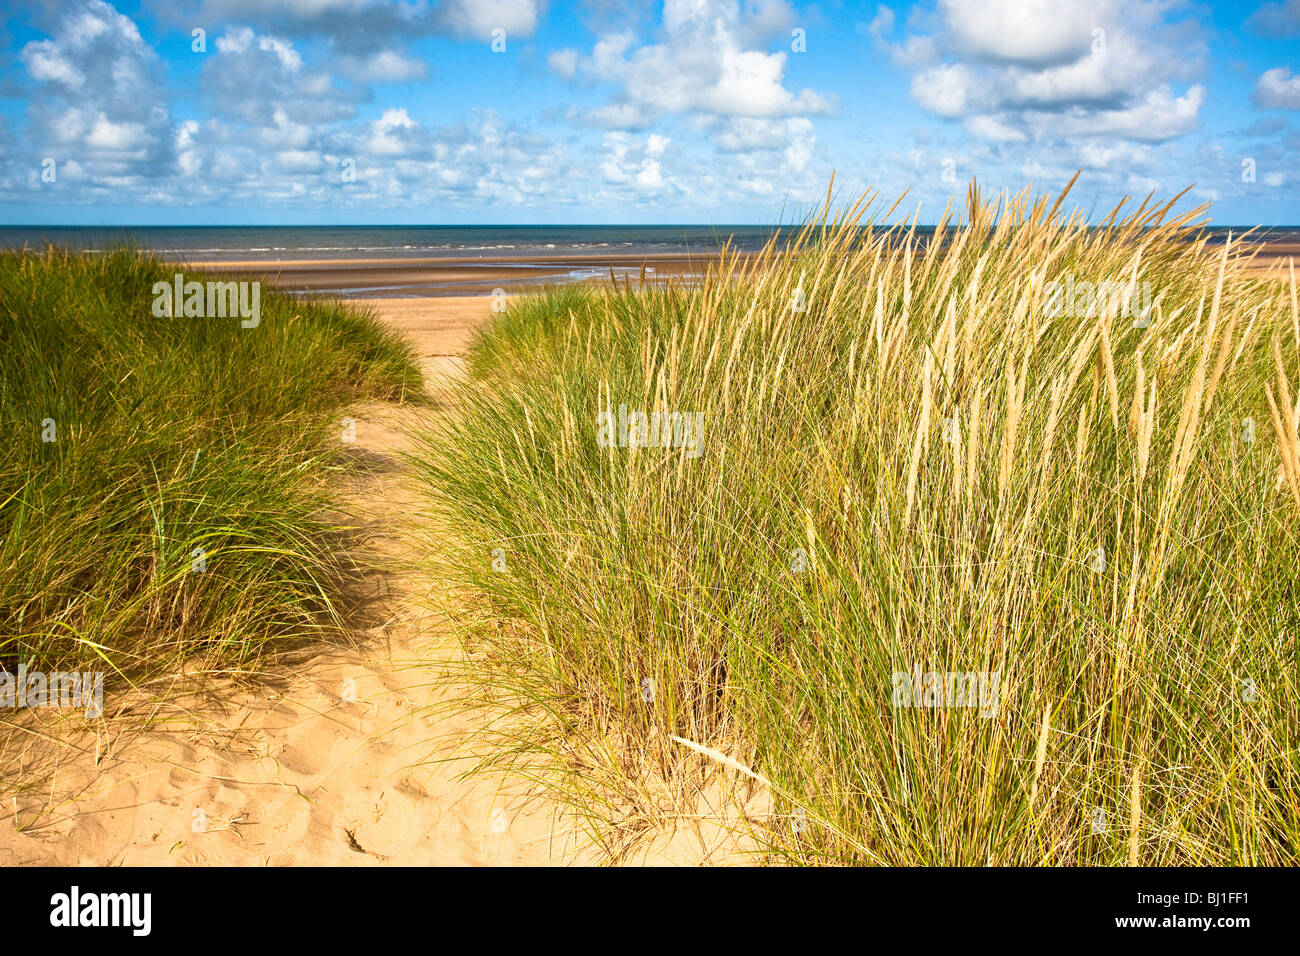 Marram grass on the sand dunes at Thornham, Norfolk - Stock Image